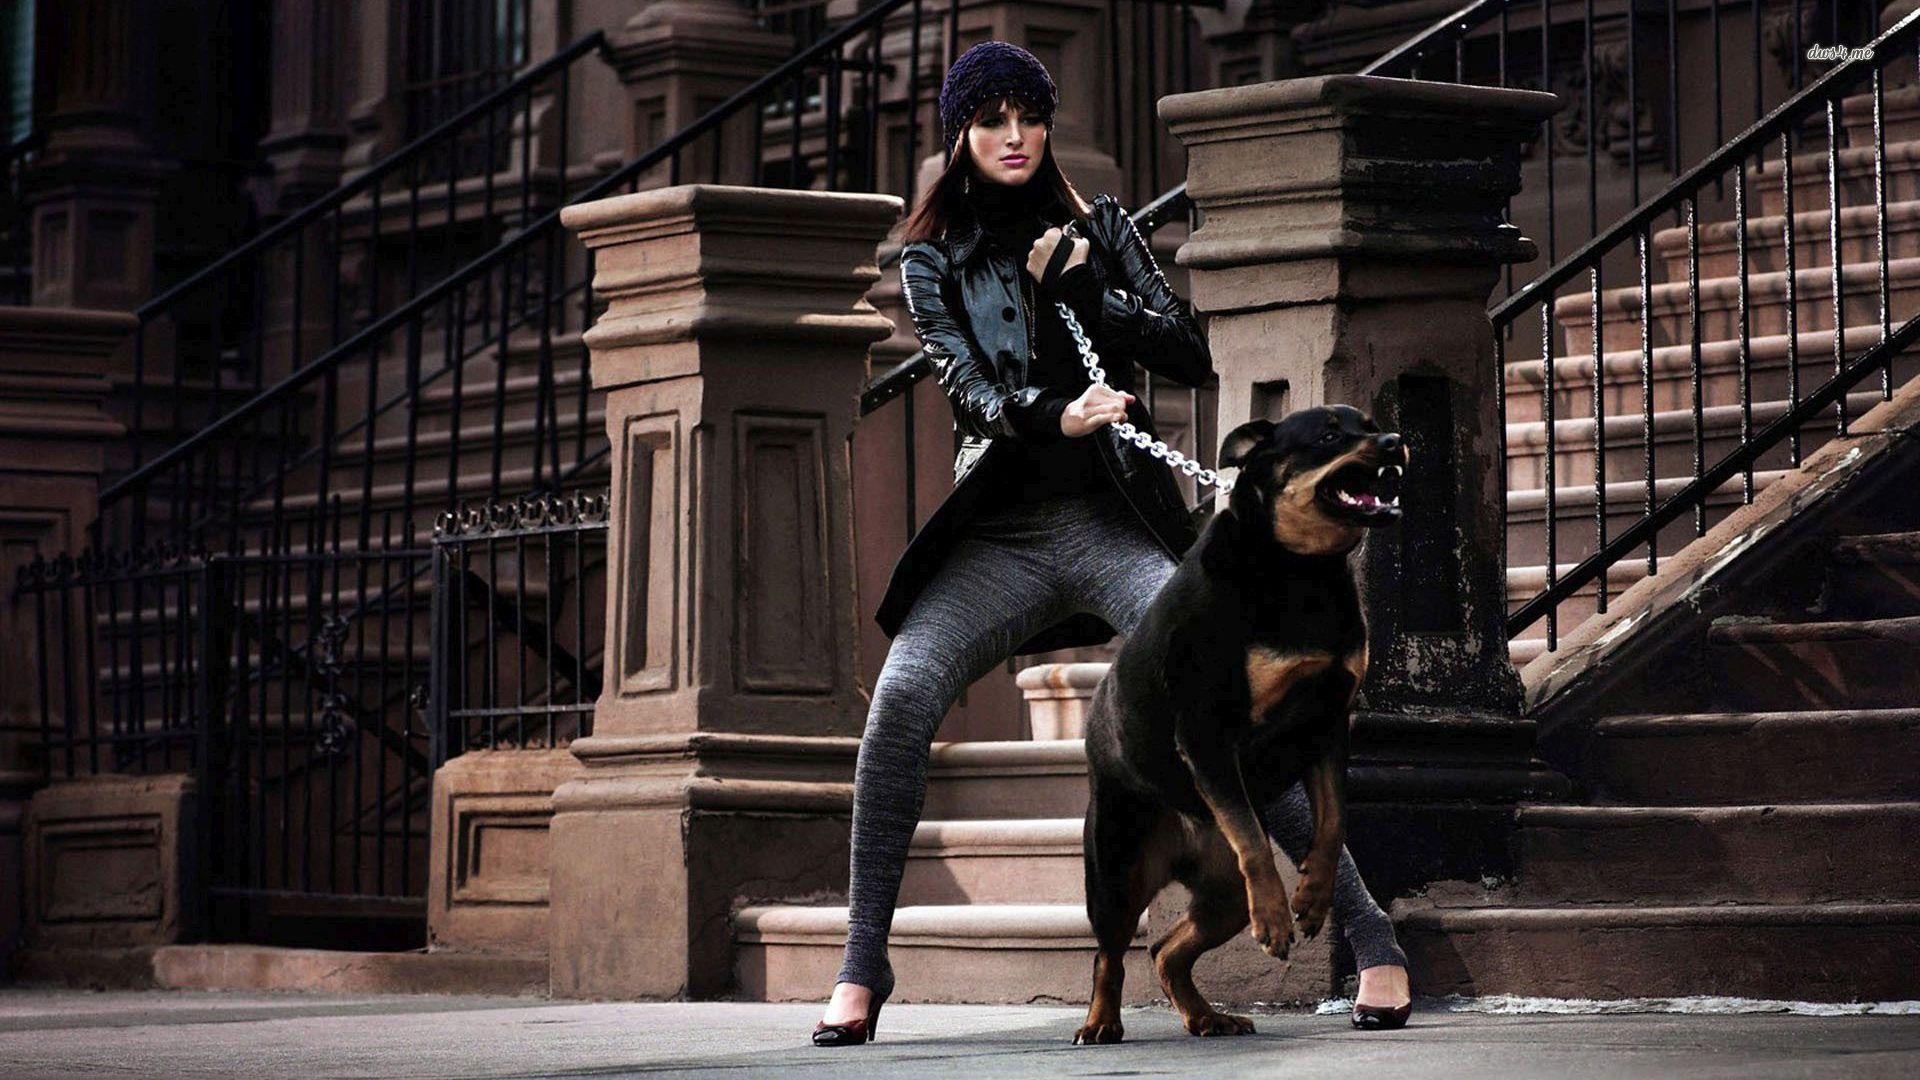 Rottweilers Rottweiler Dog Photography Dog Wallpaper